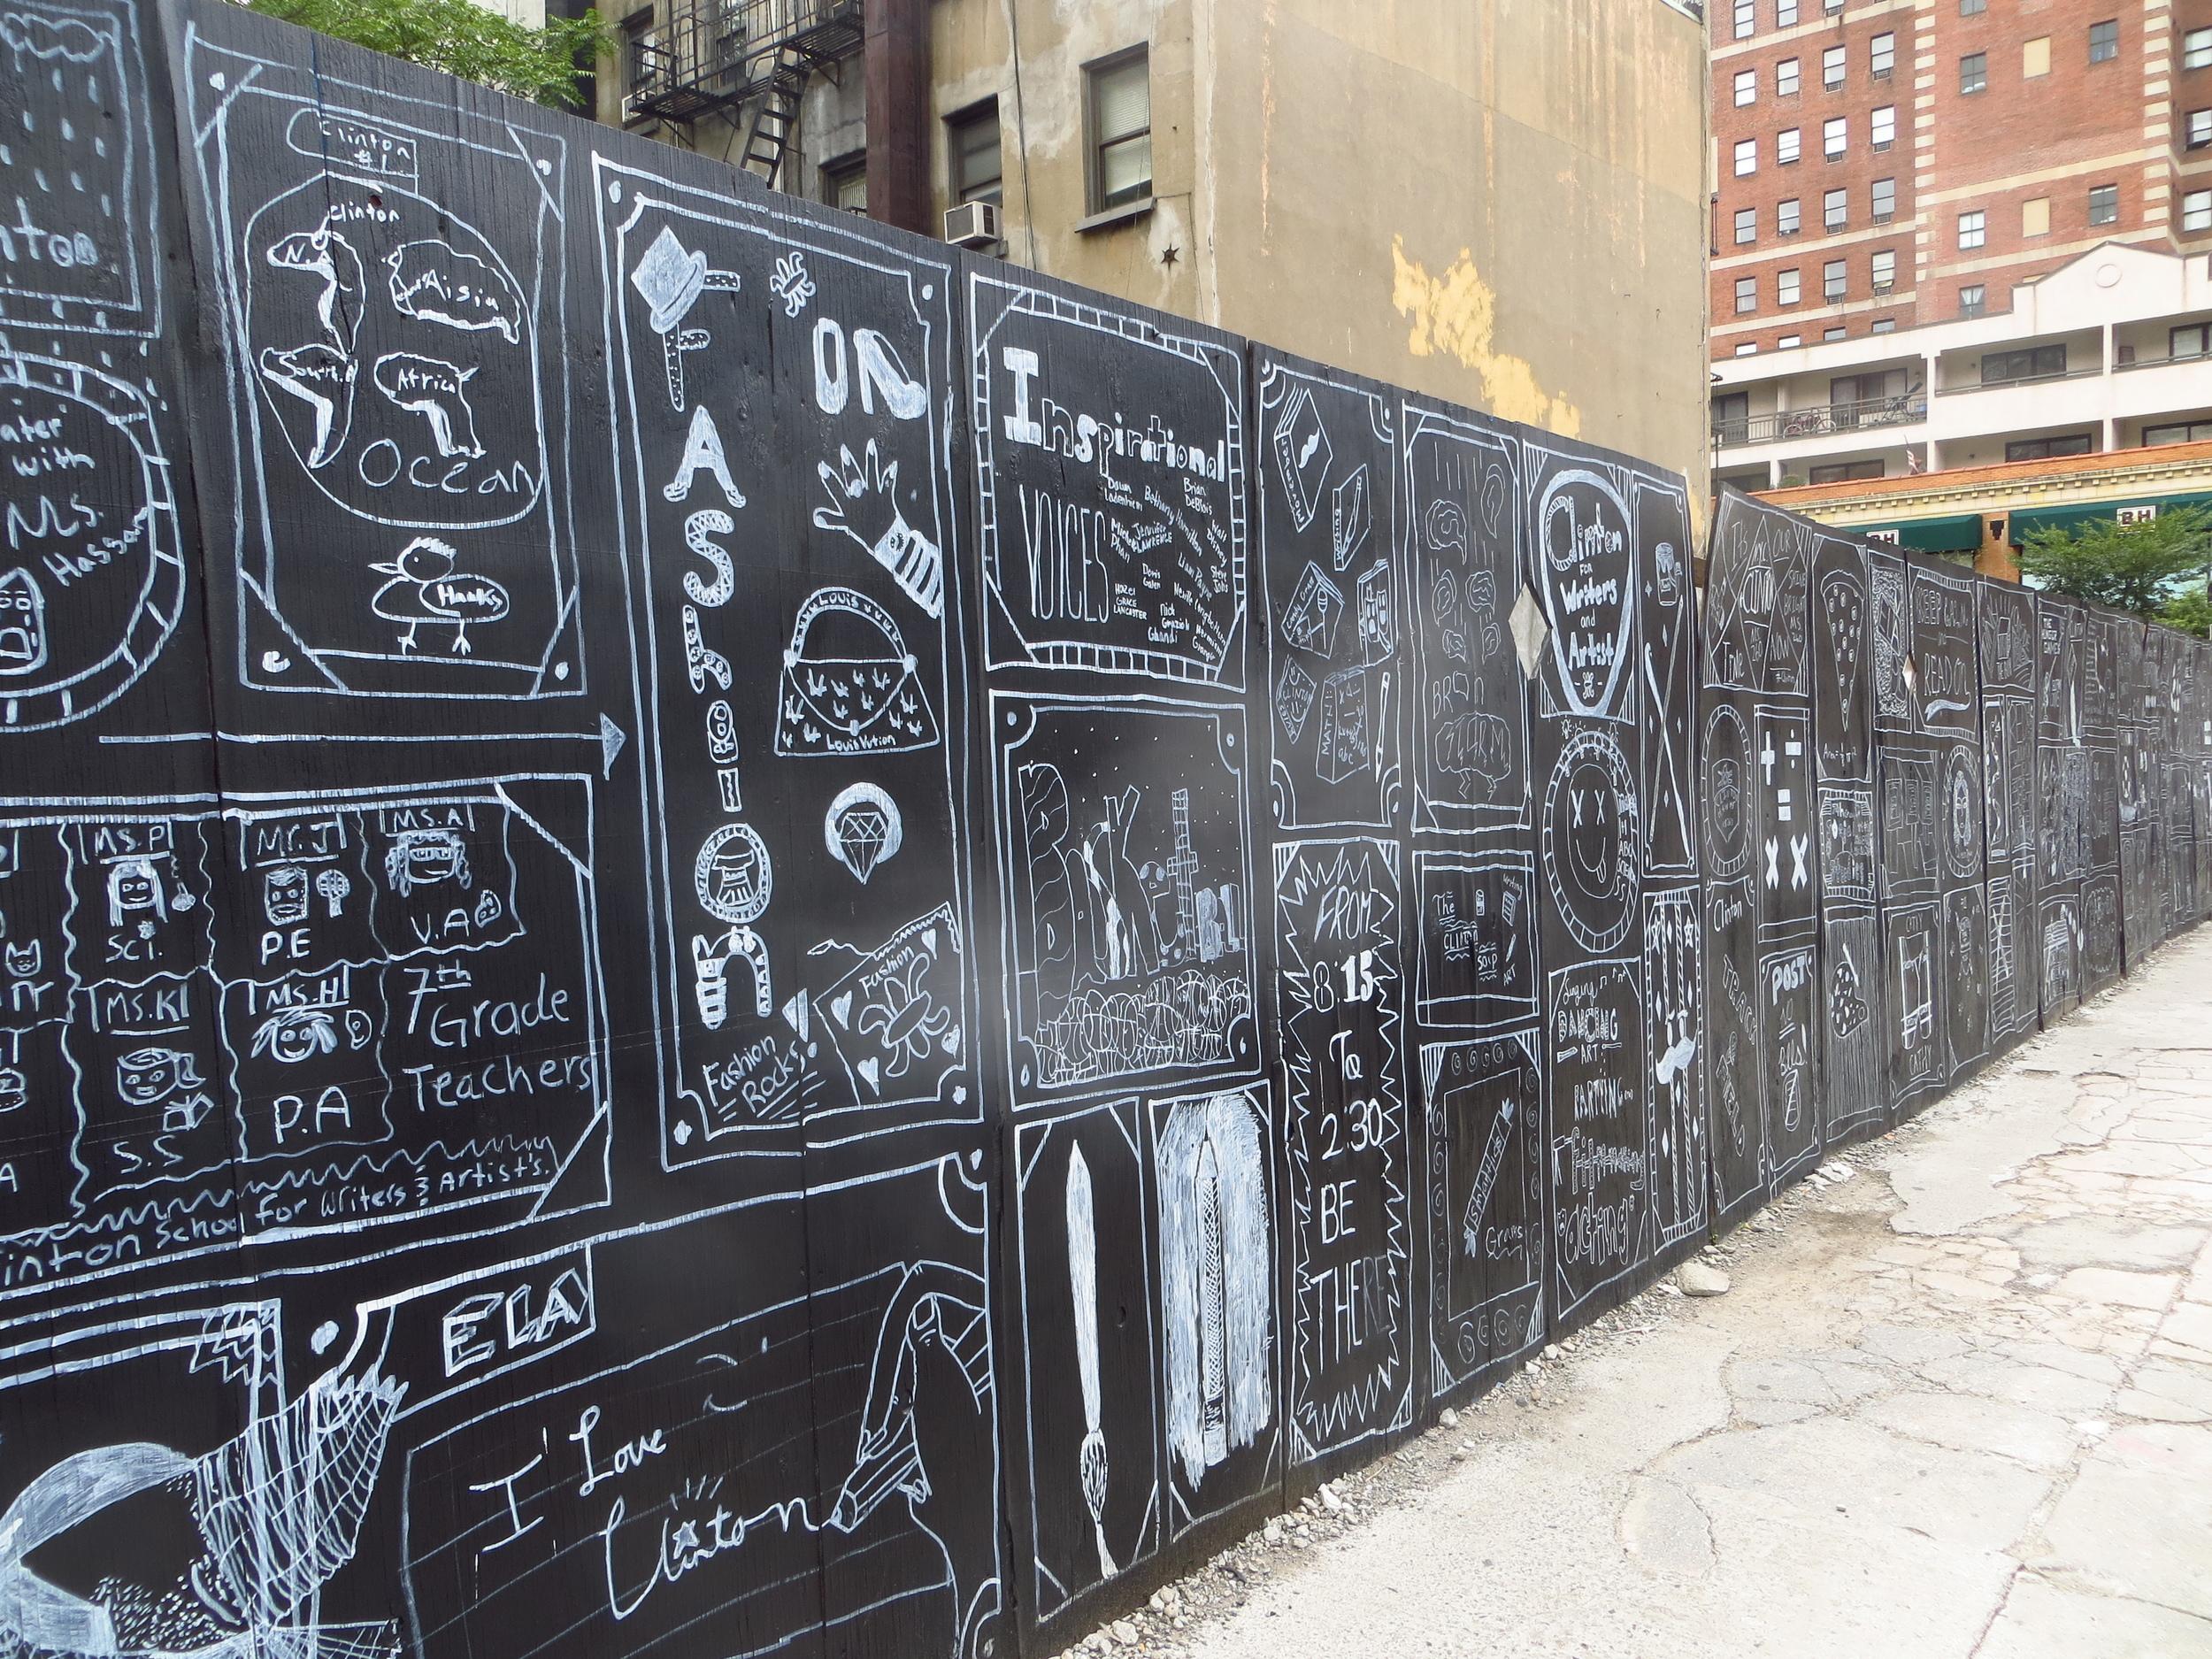 Chalk boards